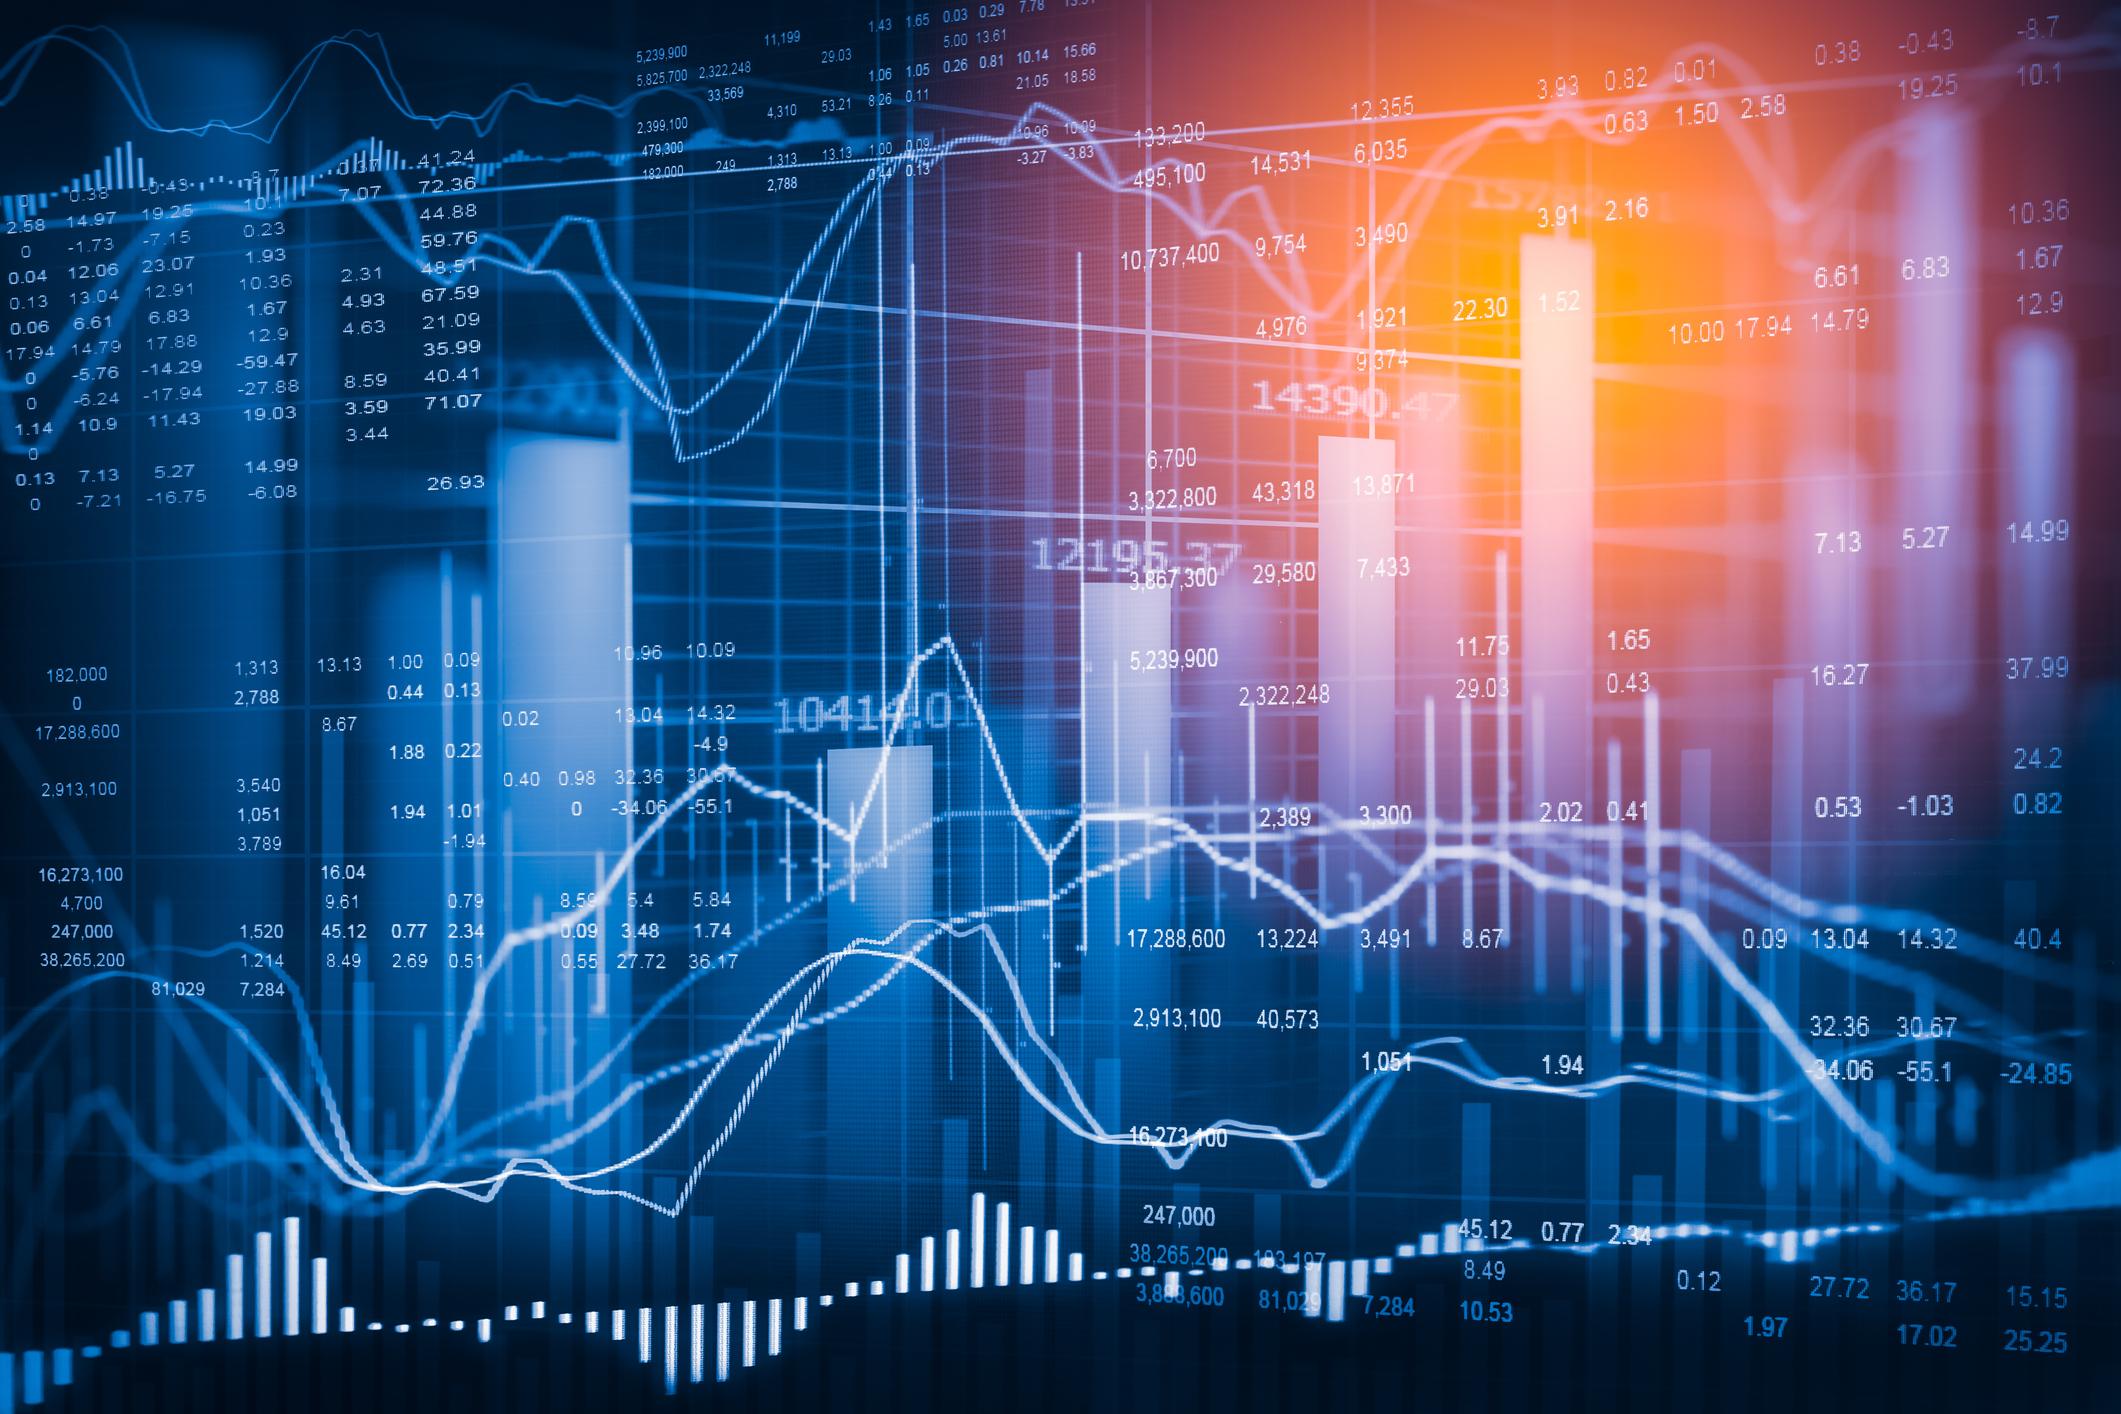 Bar chart with market indicators